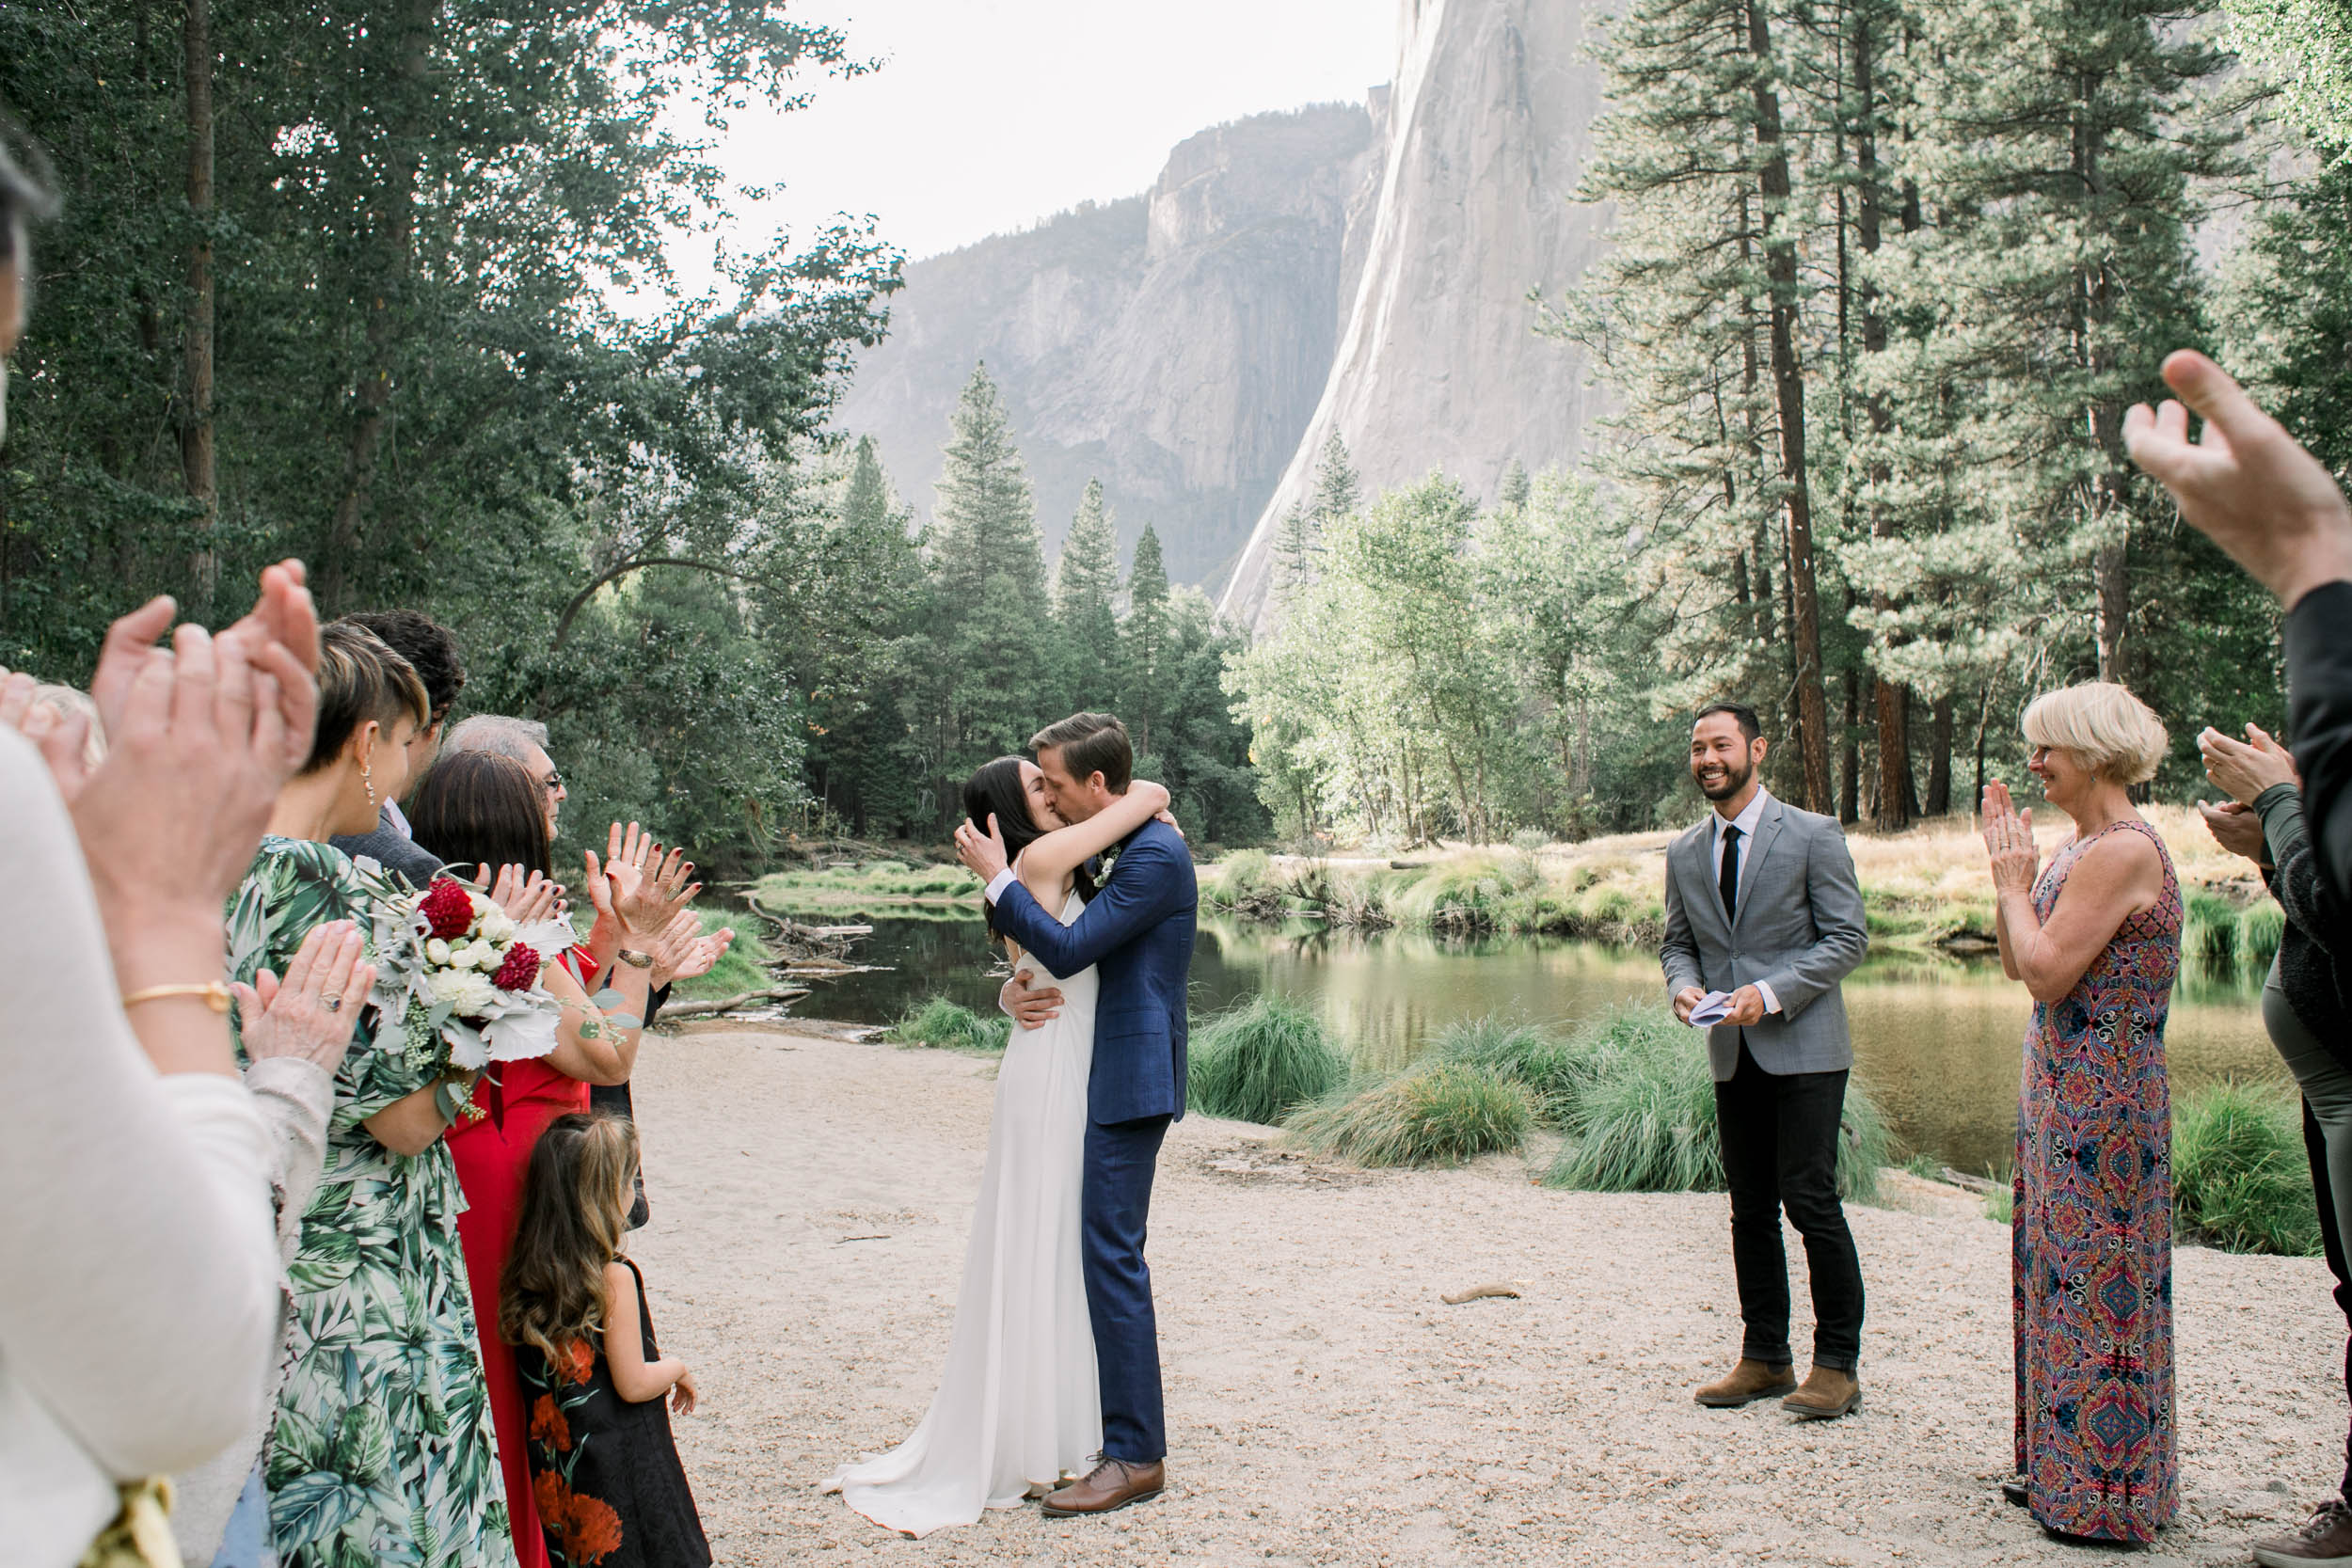 Intimate Yosemite Wedding_Buena Lane Photography_091318ER312-2.jpg